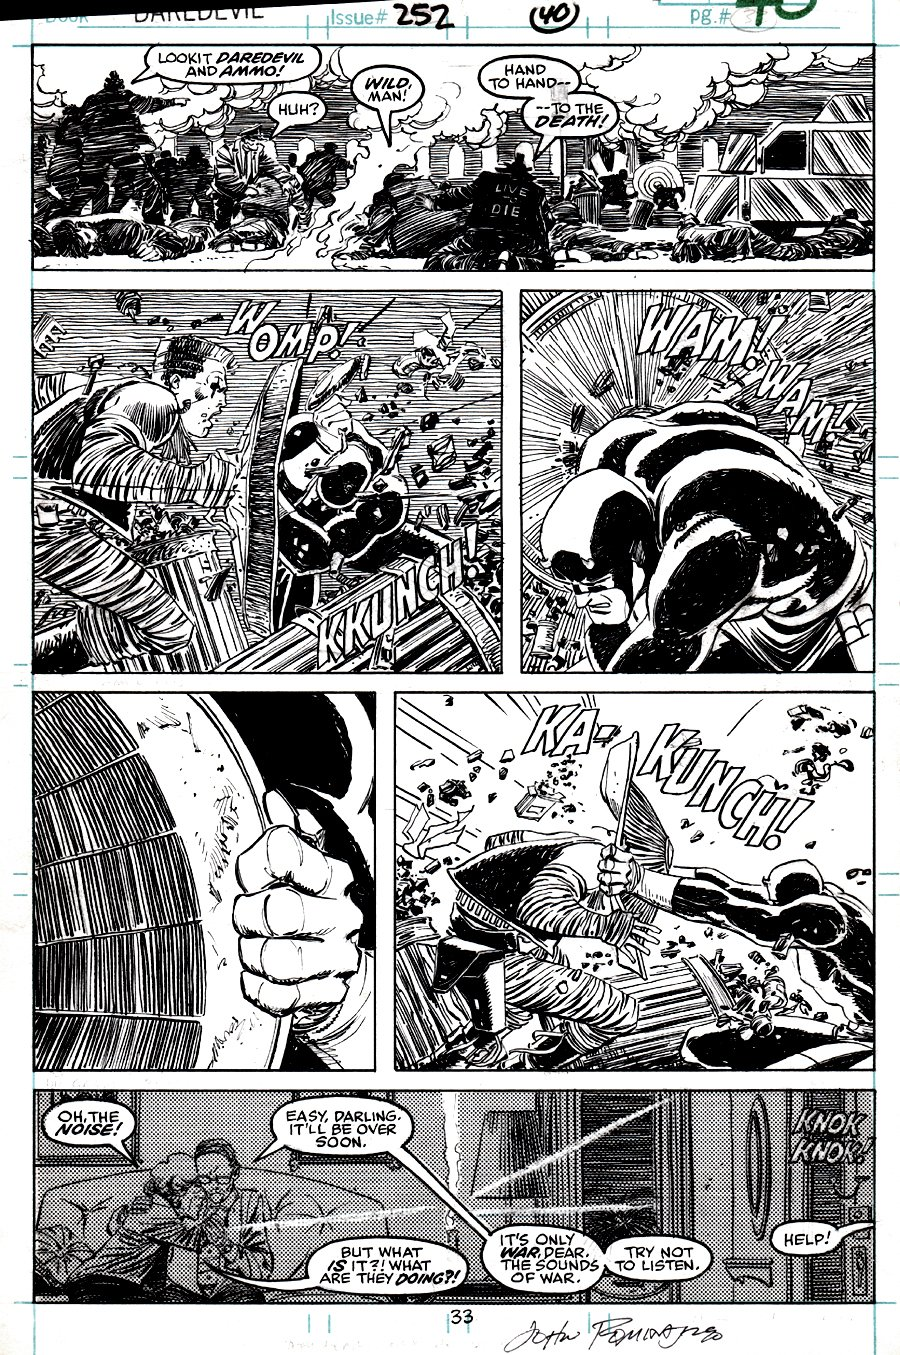 Daredevil #252 p 33 (DD BATTLE THROUGHOUT ENTIRE PAGE!) 1988